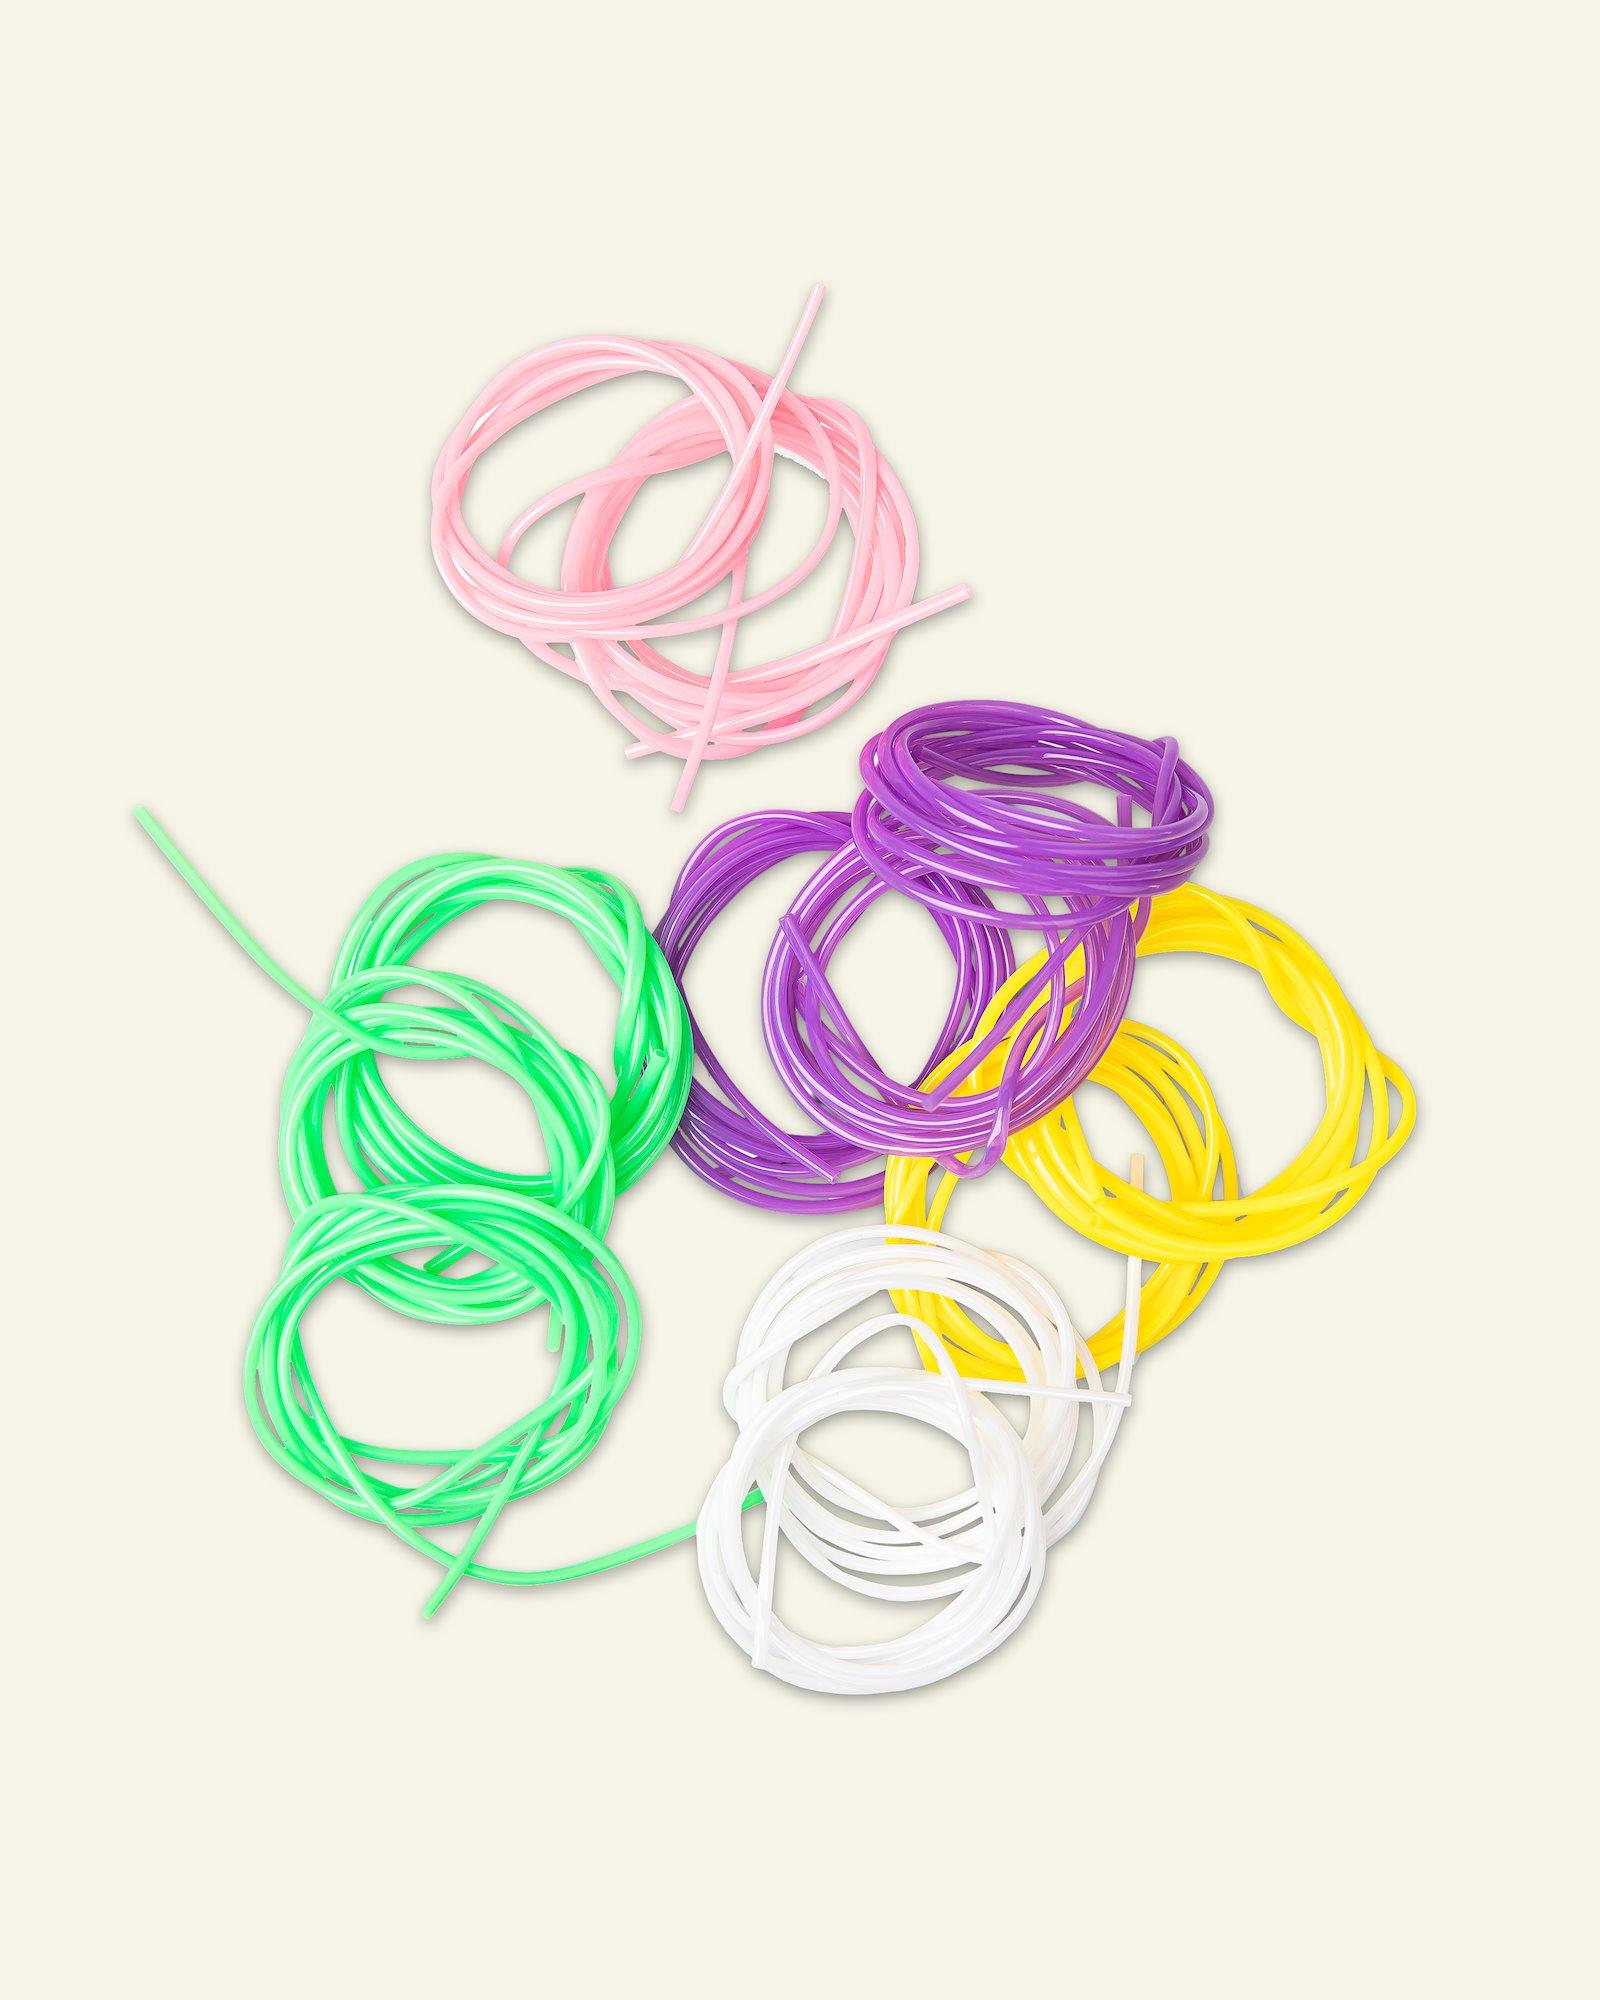 FRAYA stitch wire set 5 colours 12m